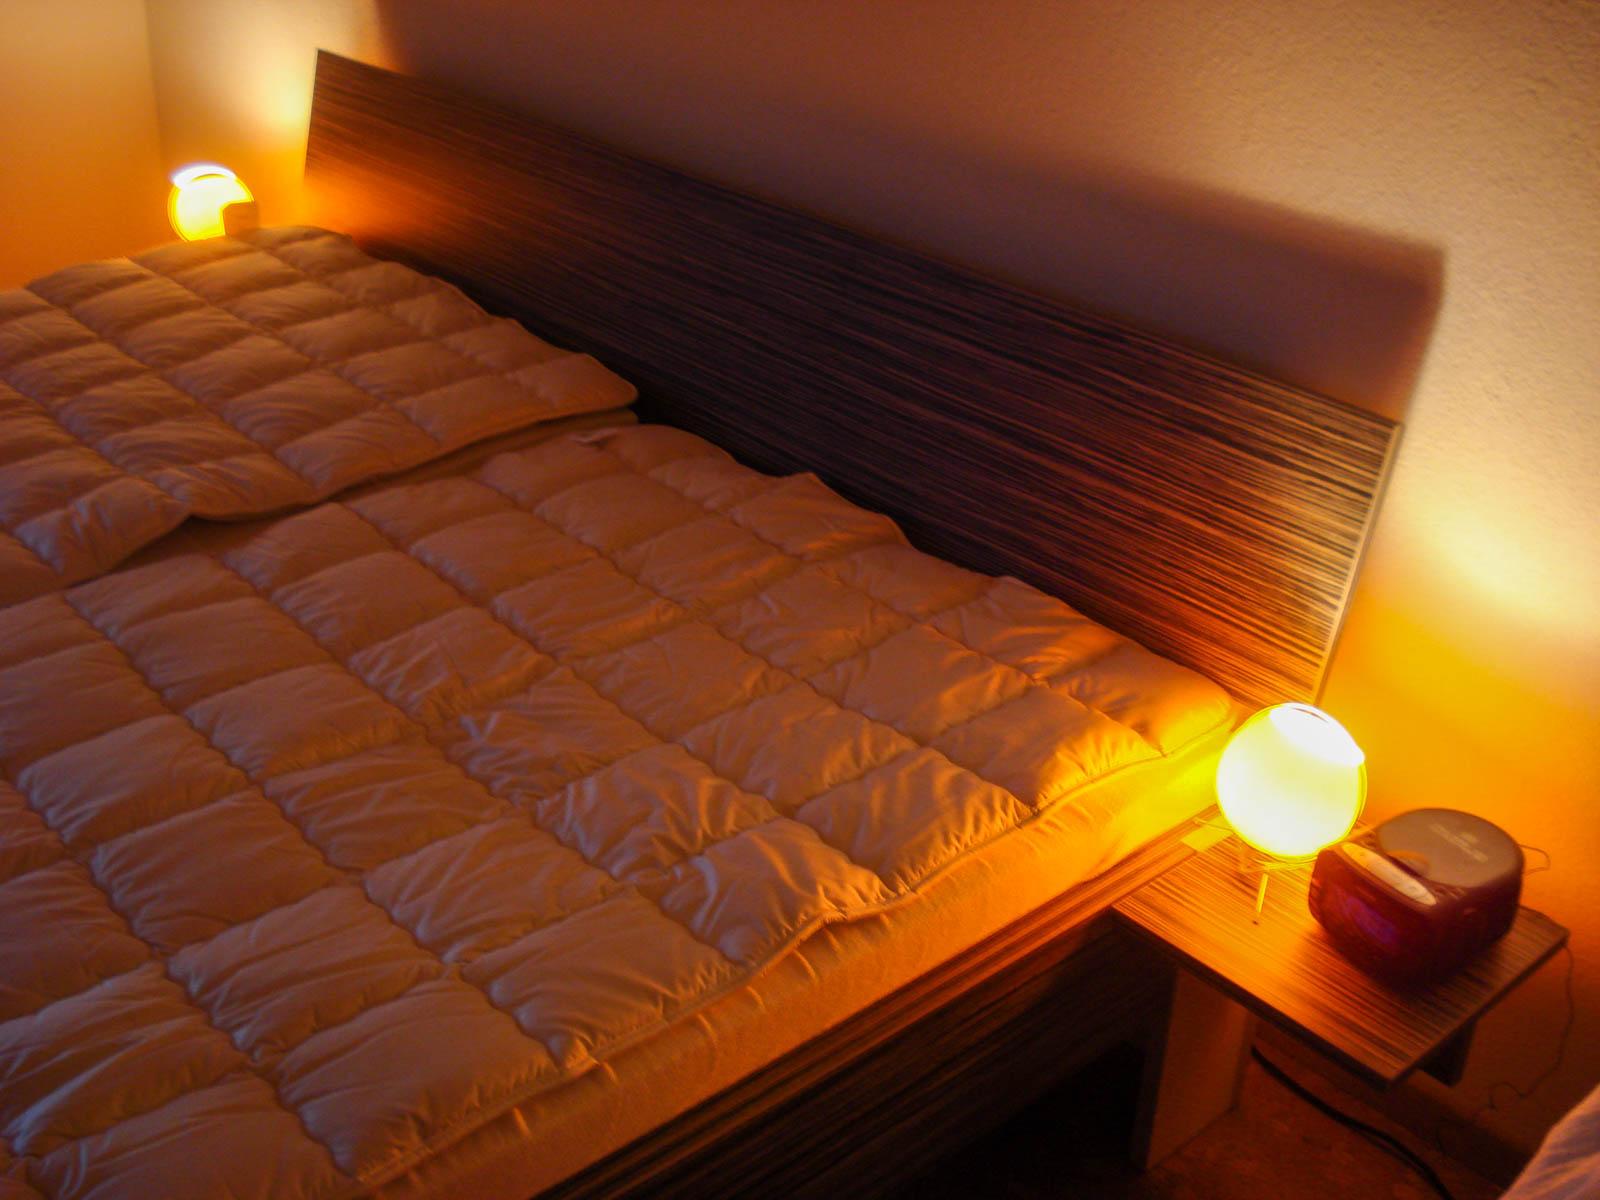 Wooddesign_Bett_Trinatura_Testbett_dunkel_Doppelbett (1)